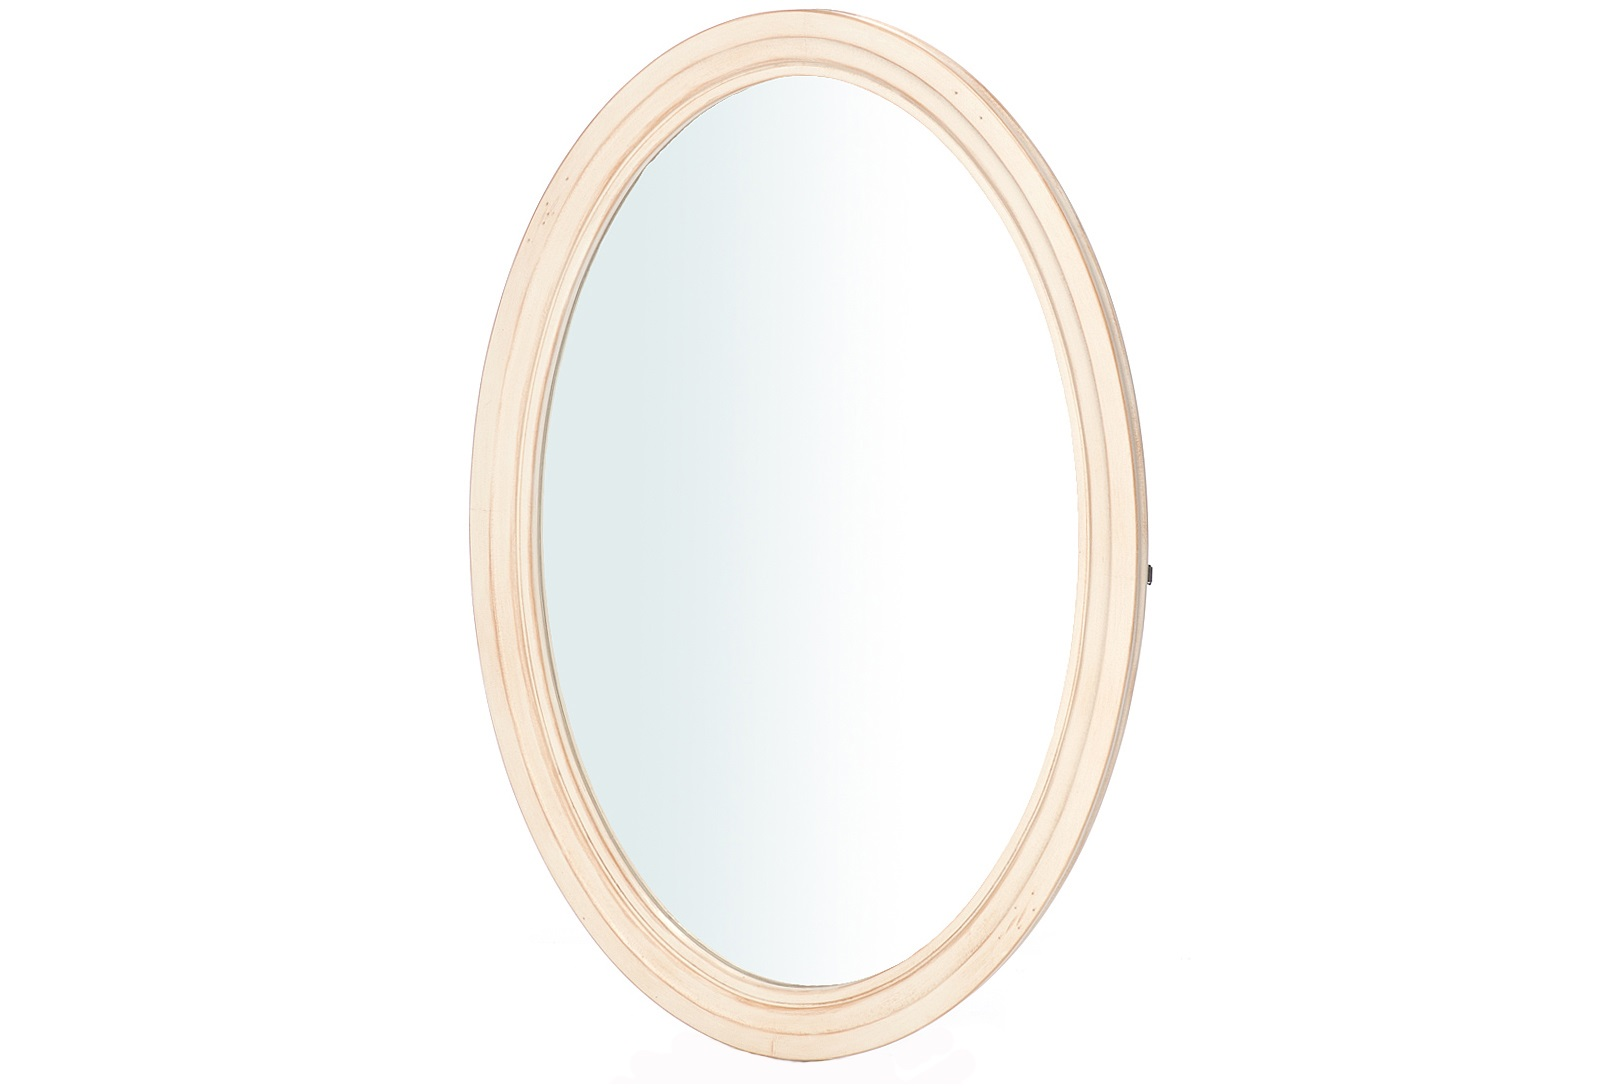 Зеркало настенноеНастенные зеркала<br><br><br>Material: Бук<br>Width см: 50<br>Depth см: 3<br>Height см: 80